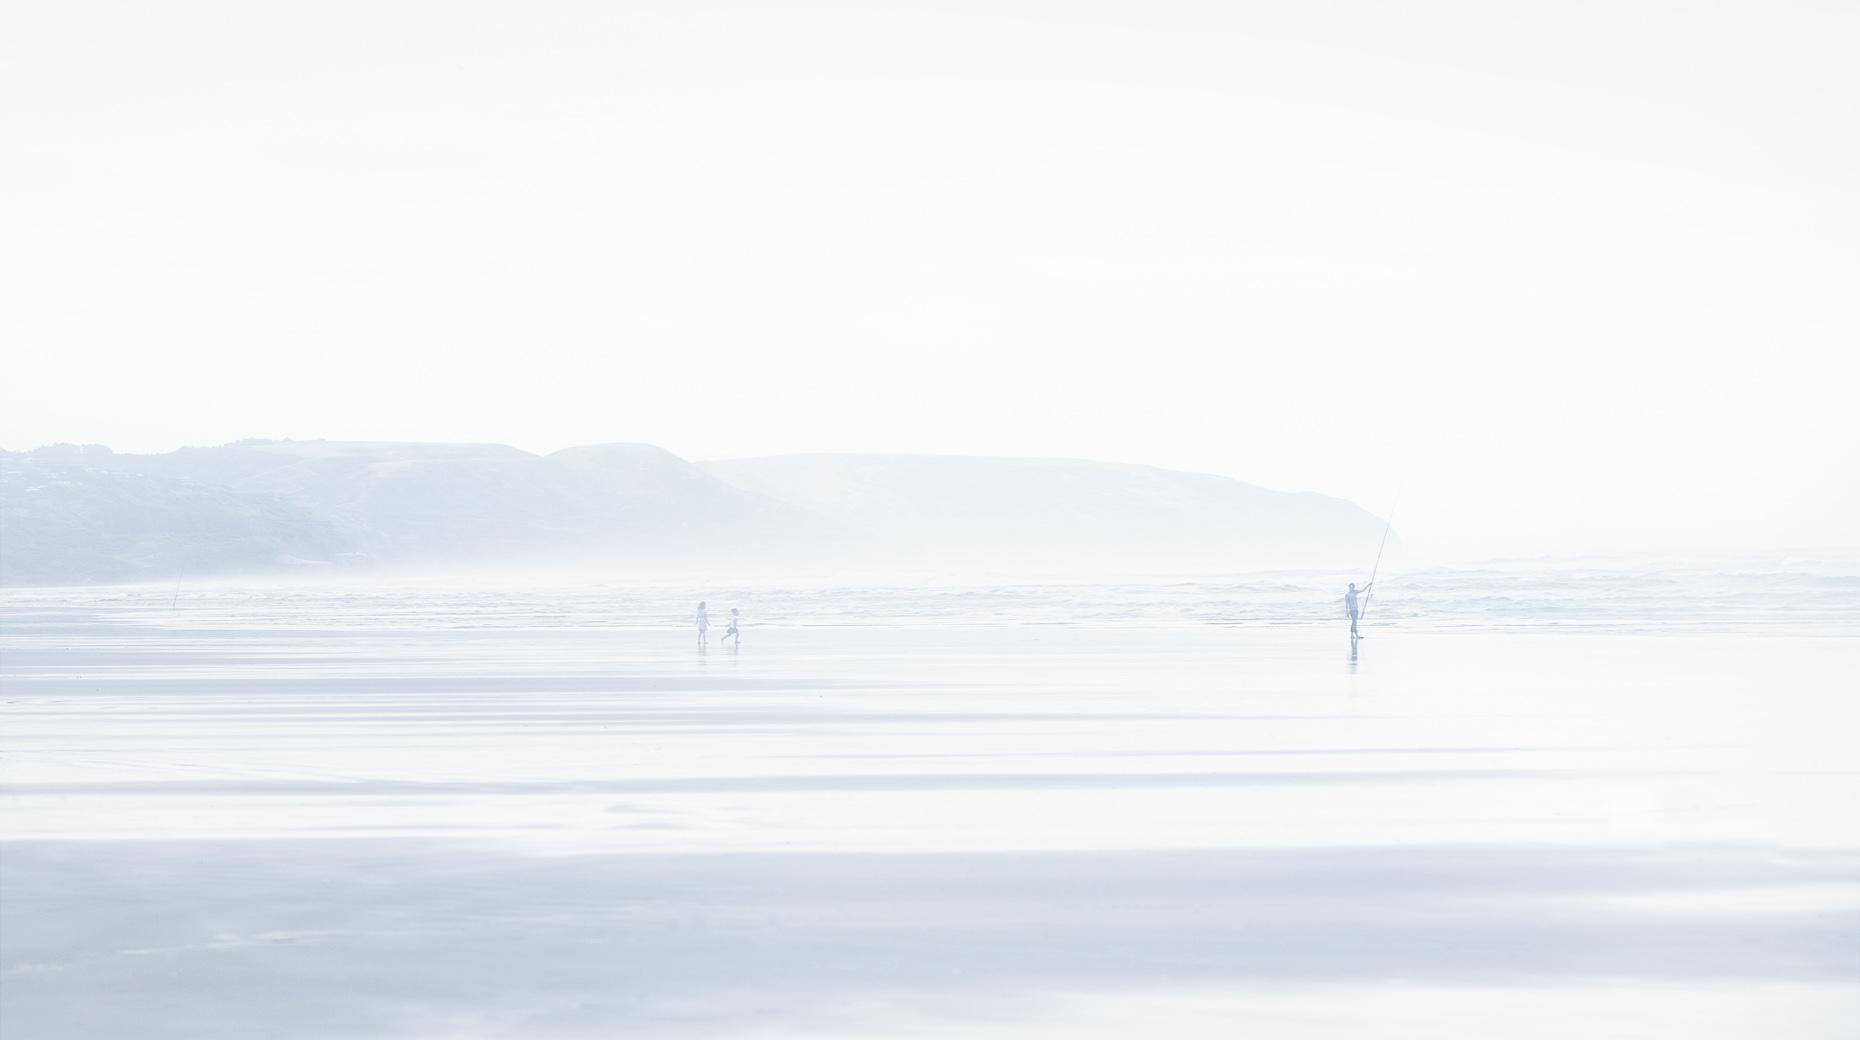 7_SurfCaster.jpg